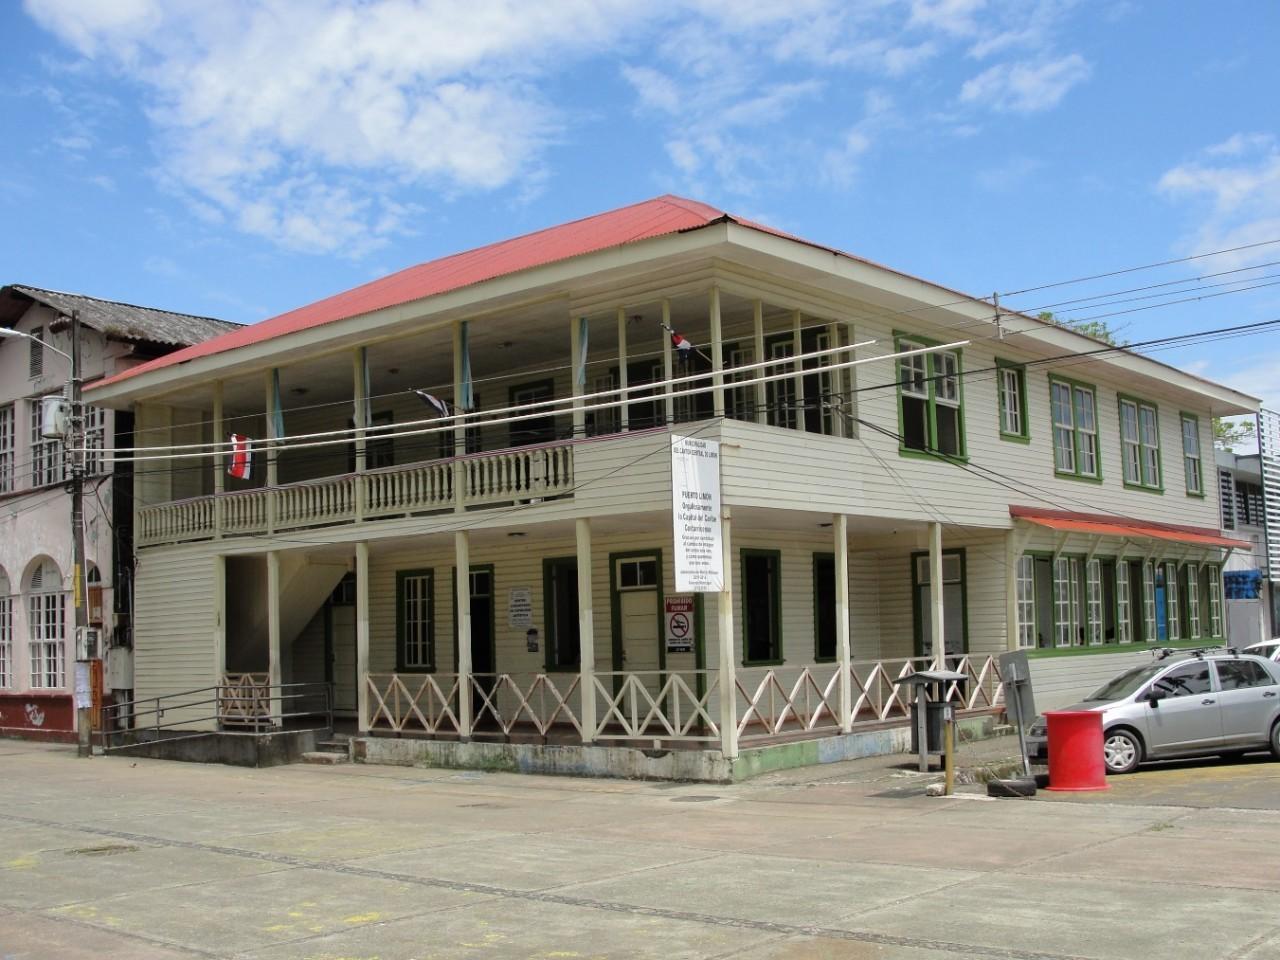 TEC investiga para conservar la arquitectura caribeña costarricense | Hoy  en el TEC